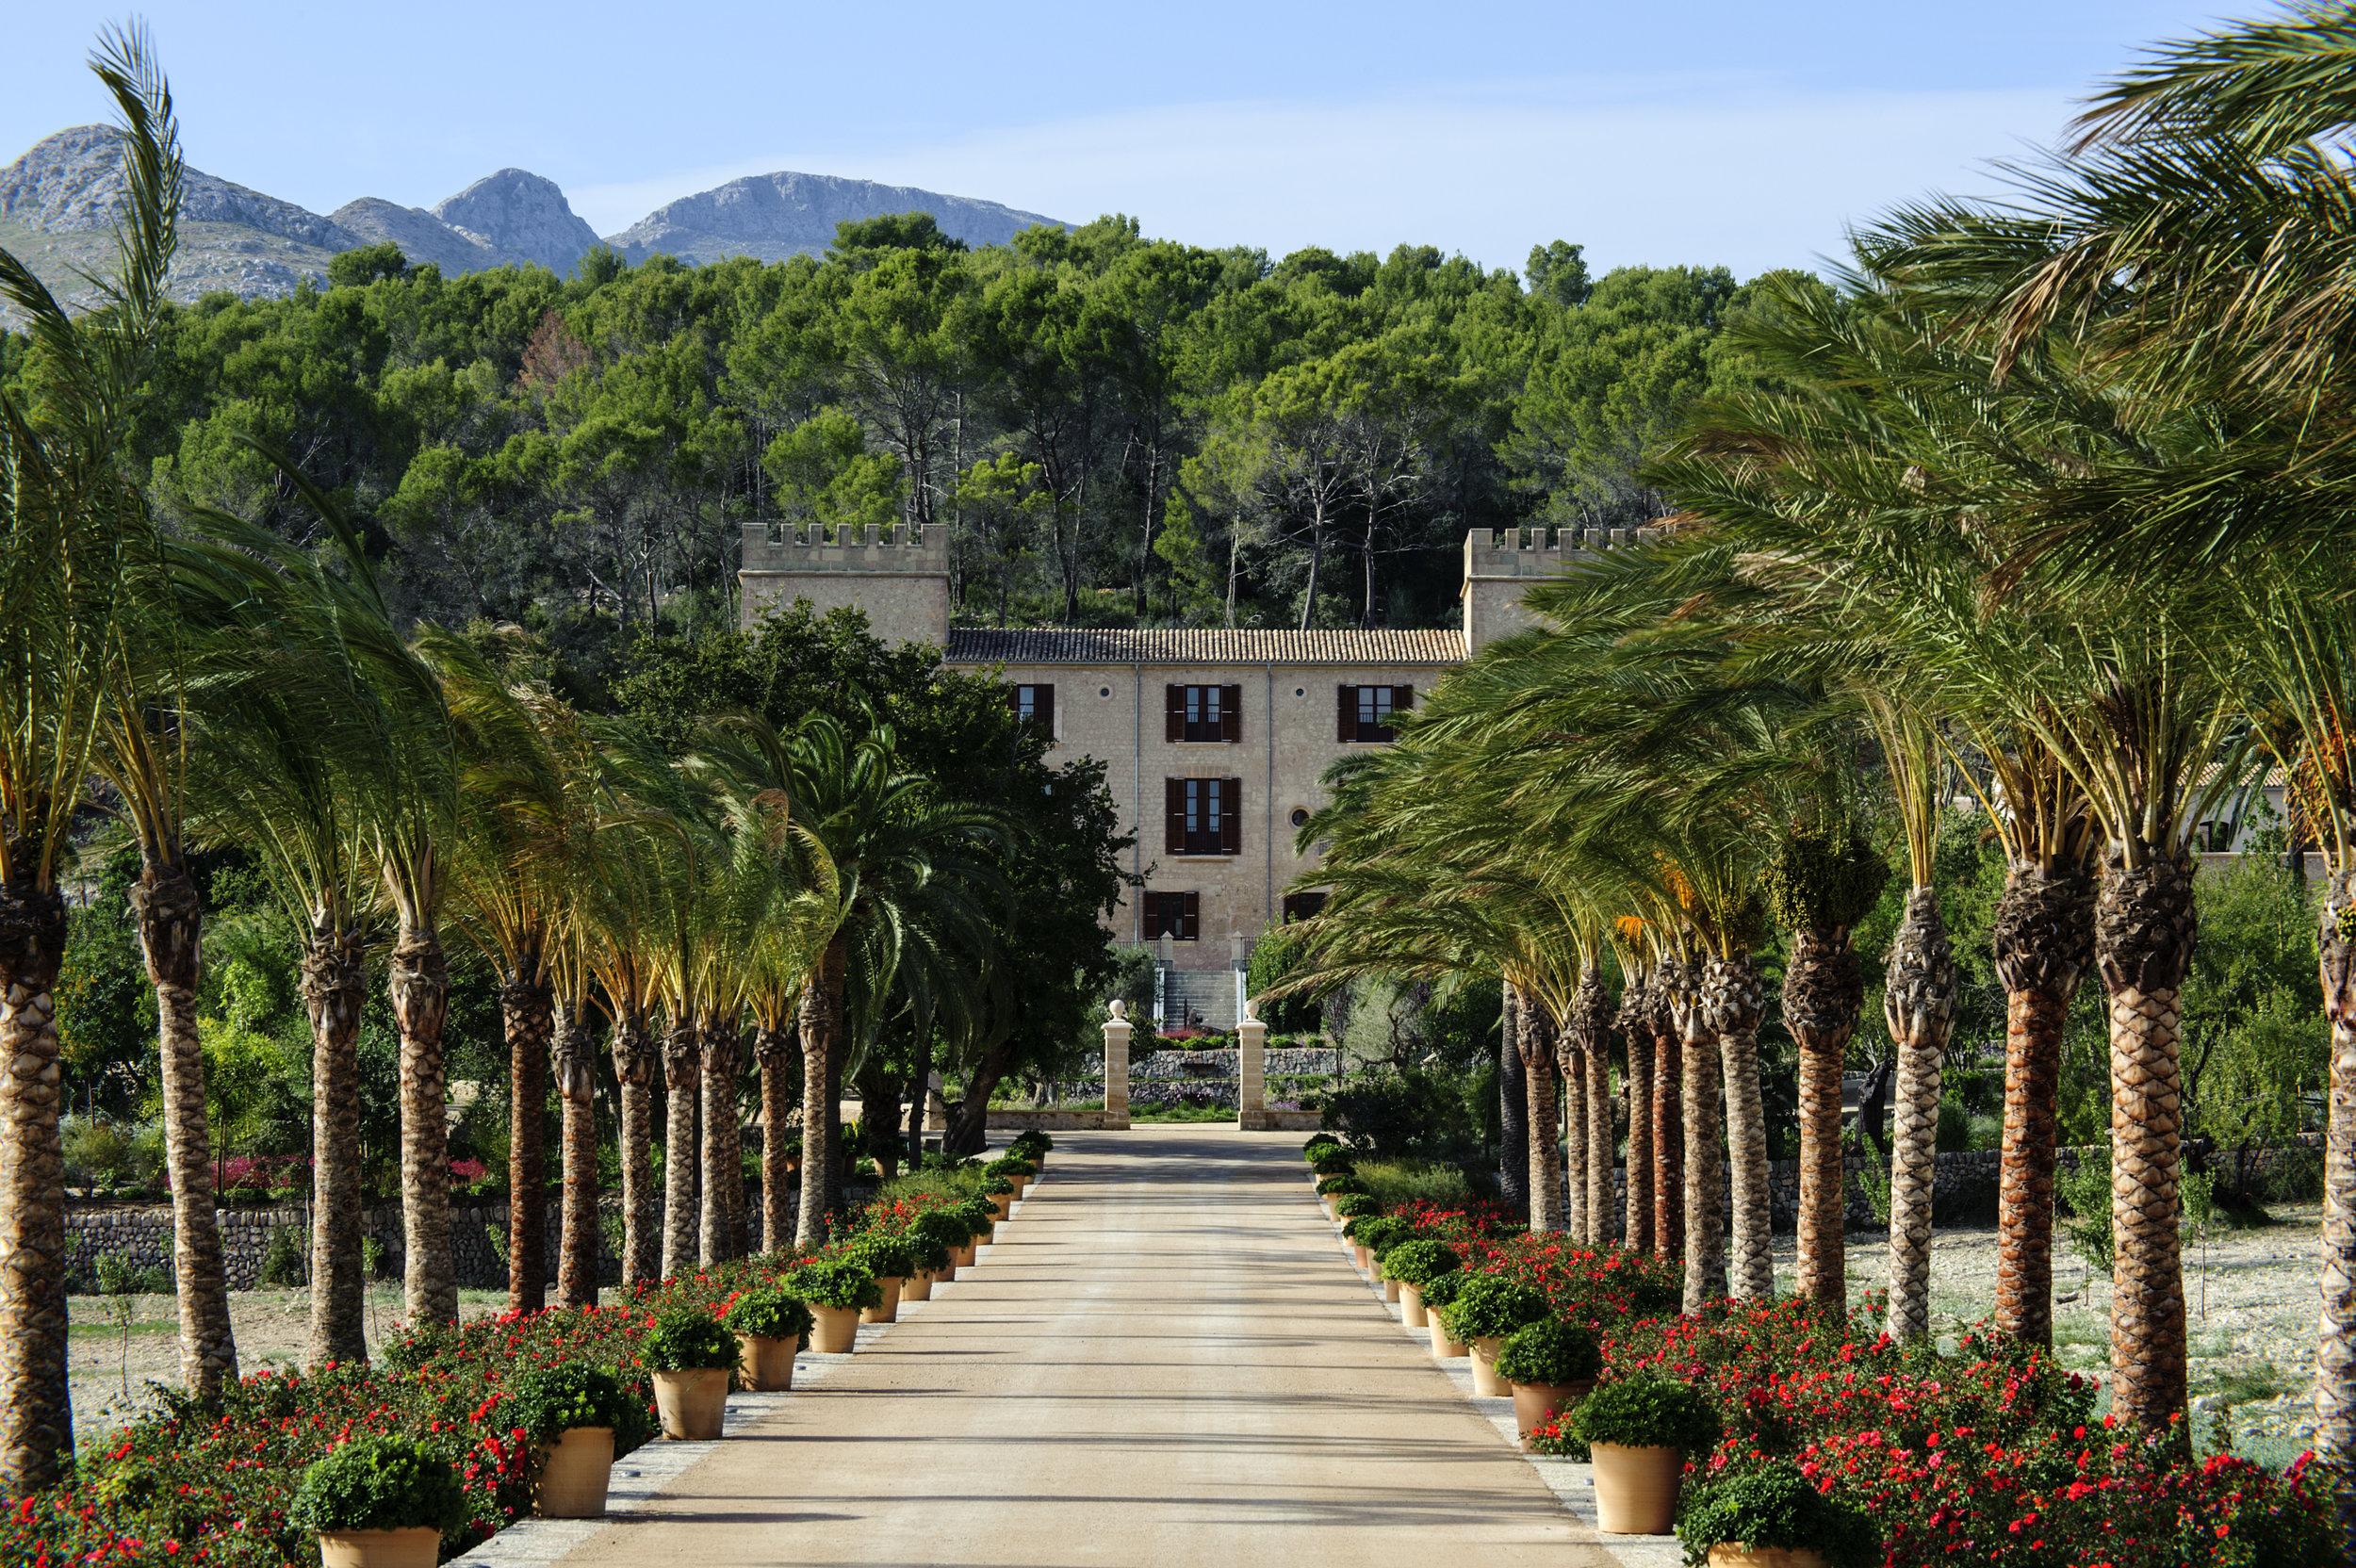 Luxury residence surrounded by serene landscape